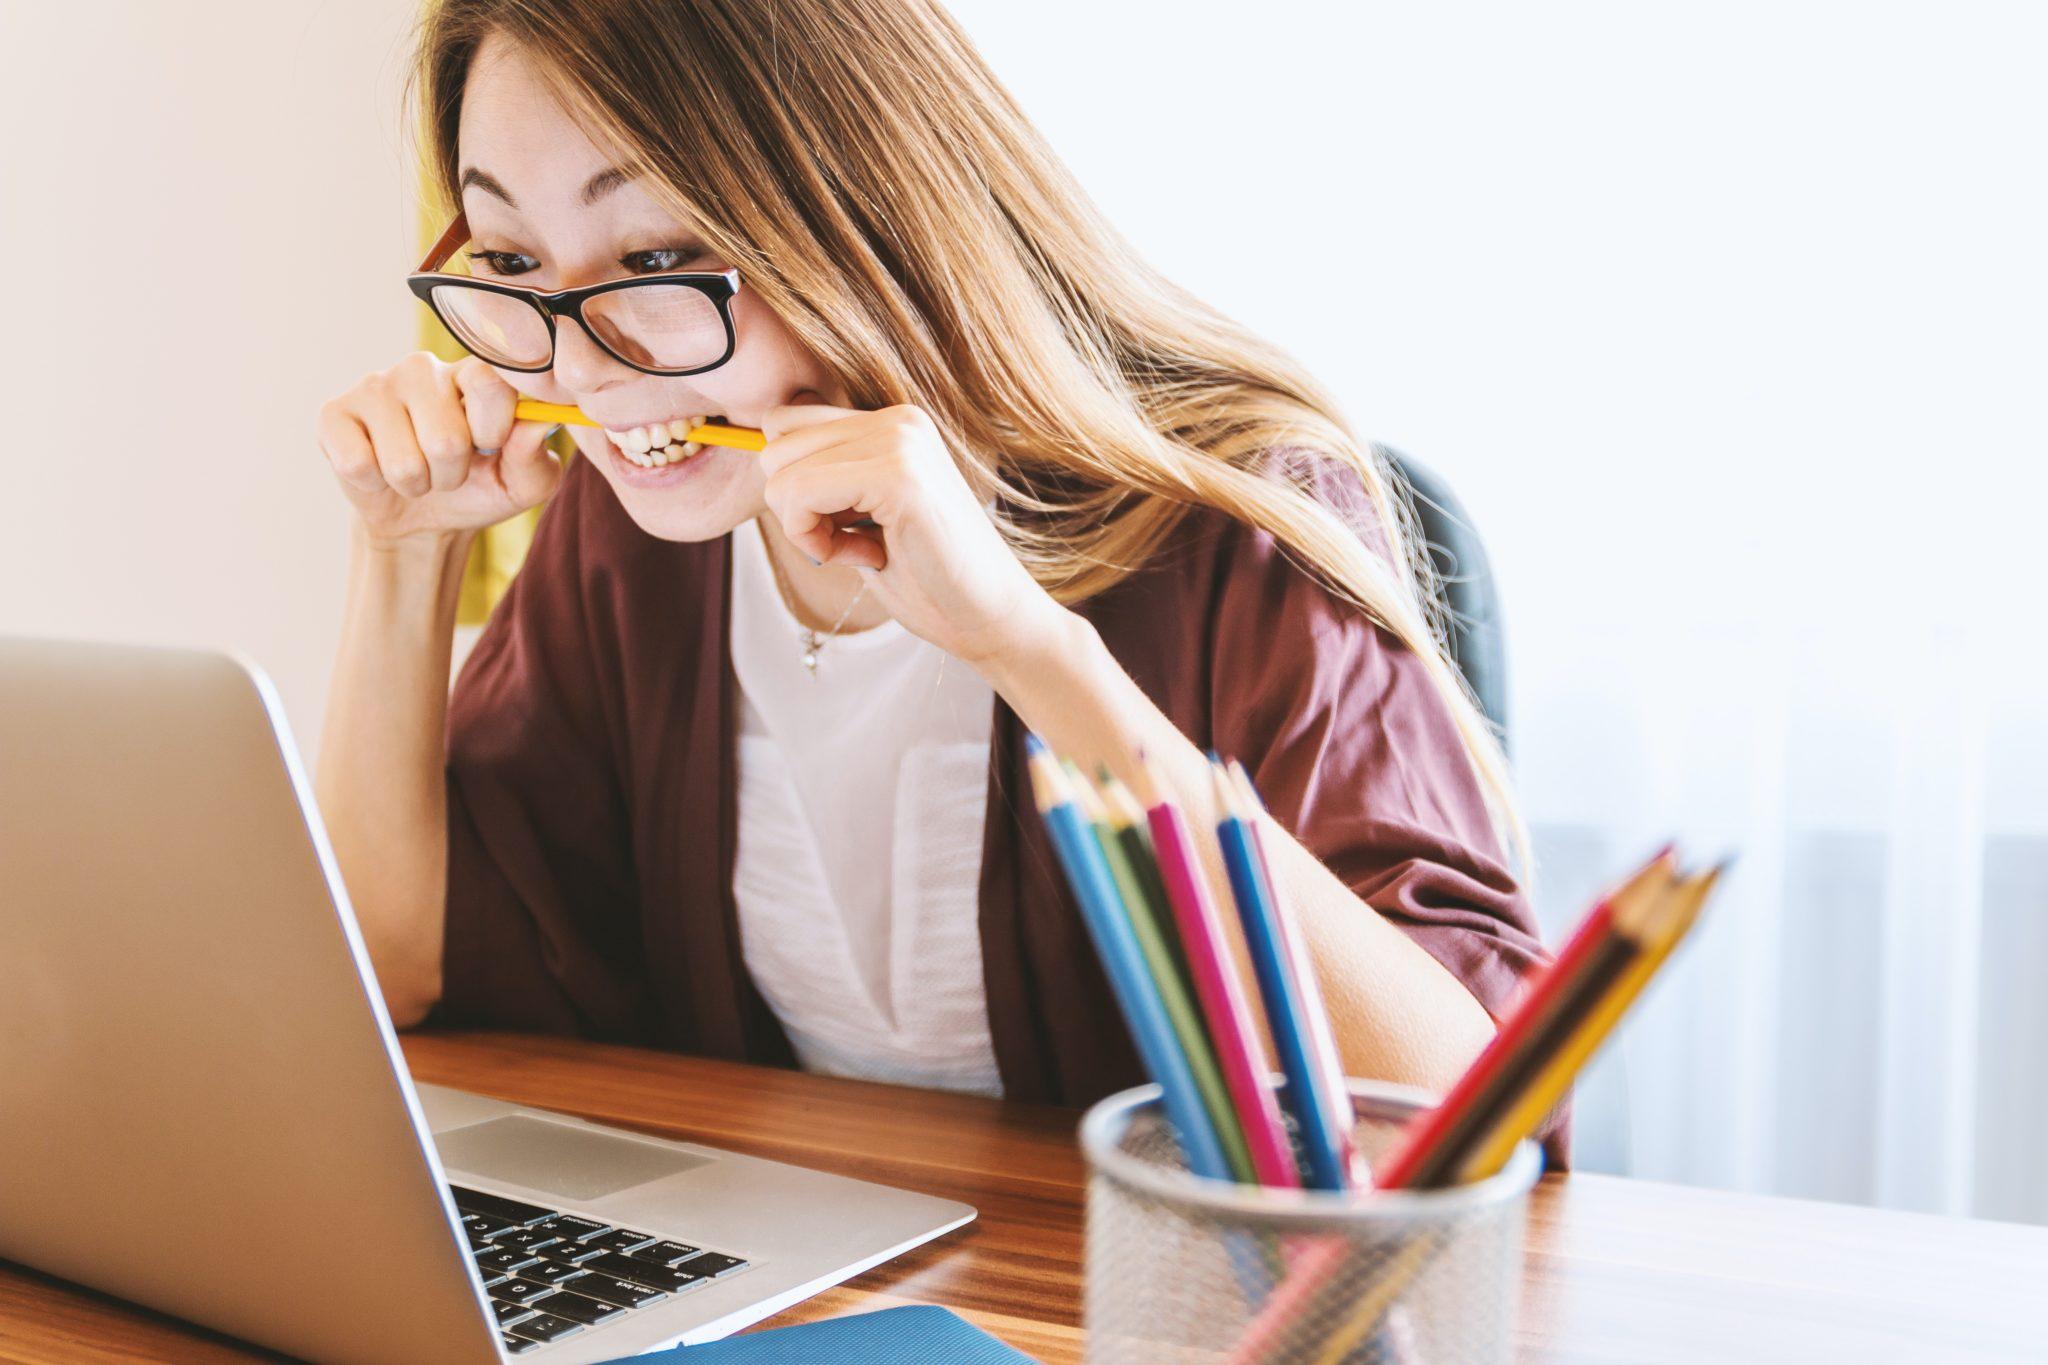 woman biting on pencil looking at computer